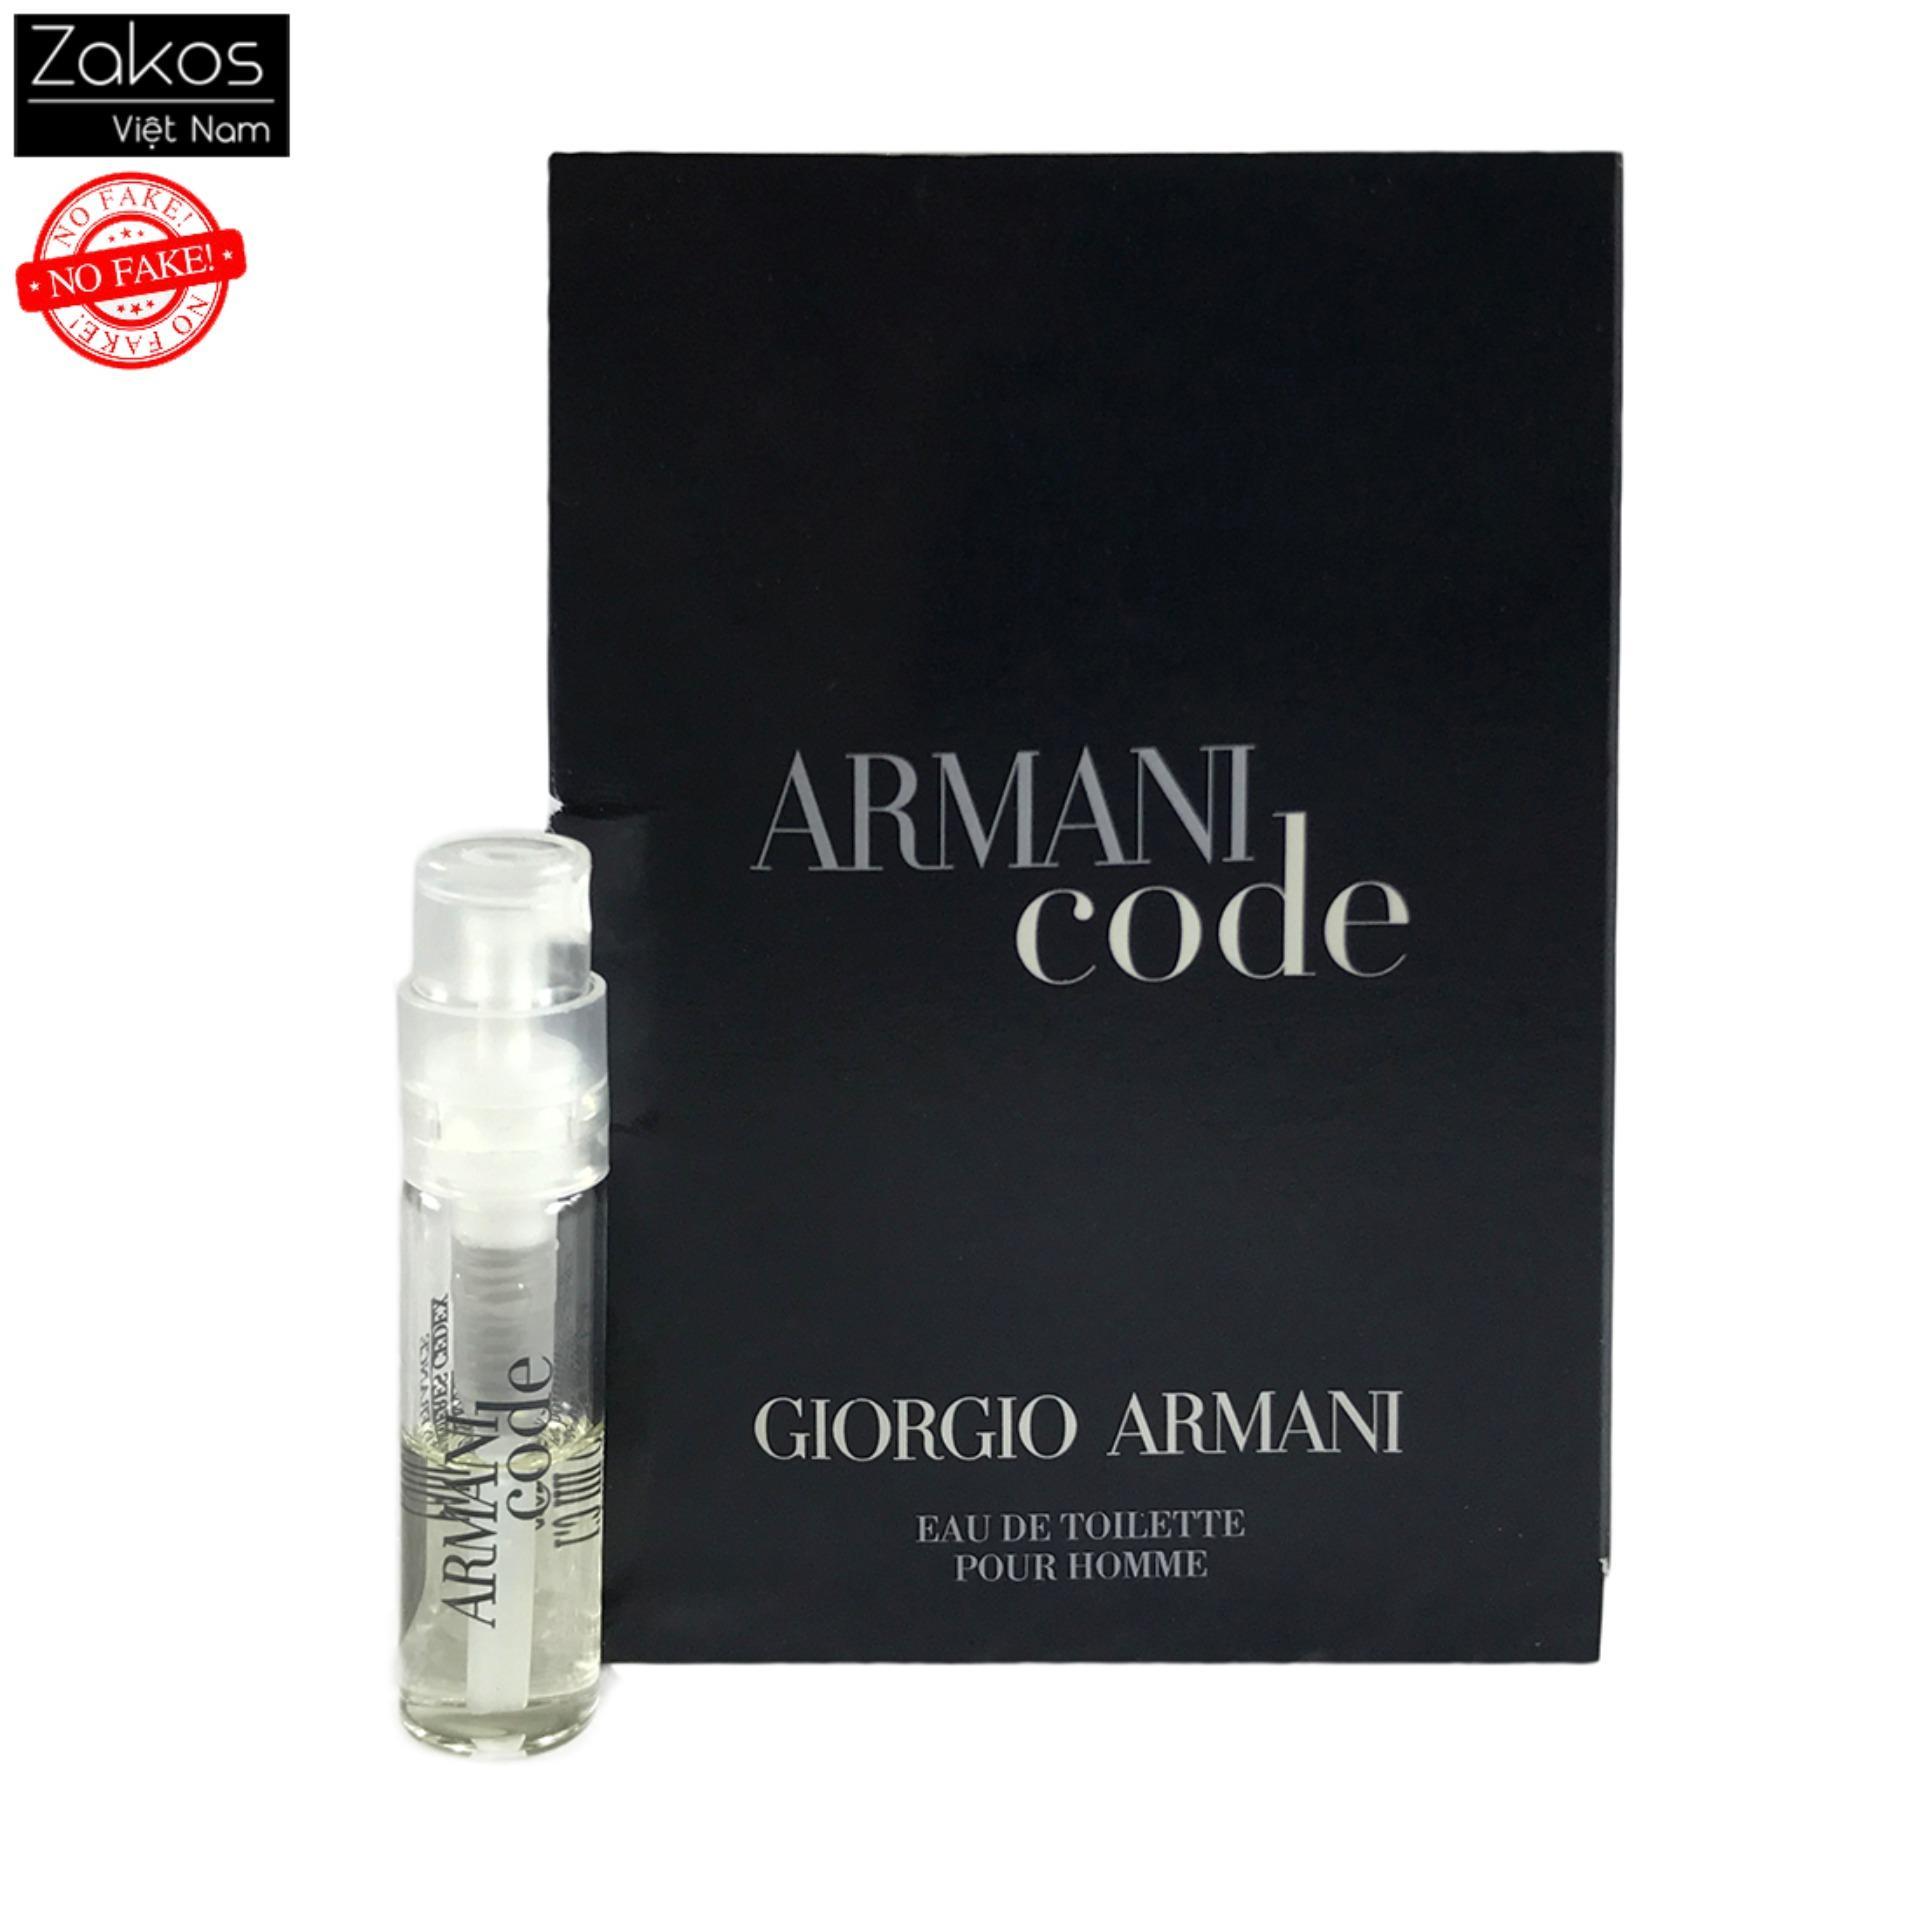 Nước hoa Armani Code for men mẫu thử 1.5ml